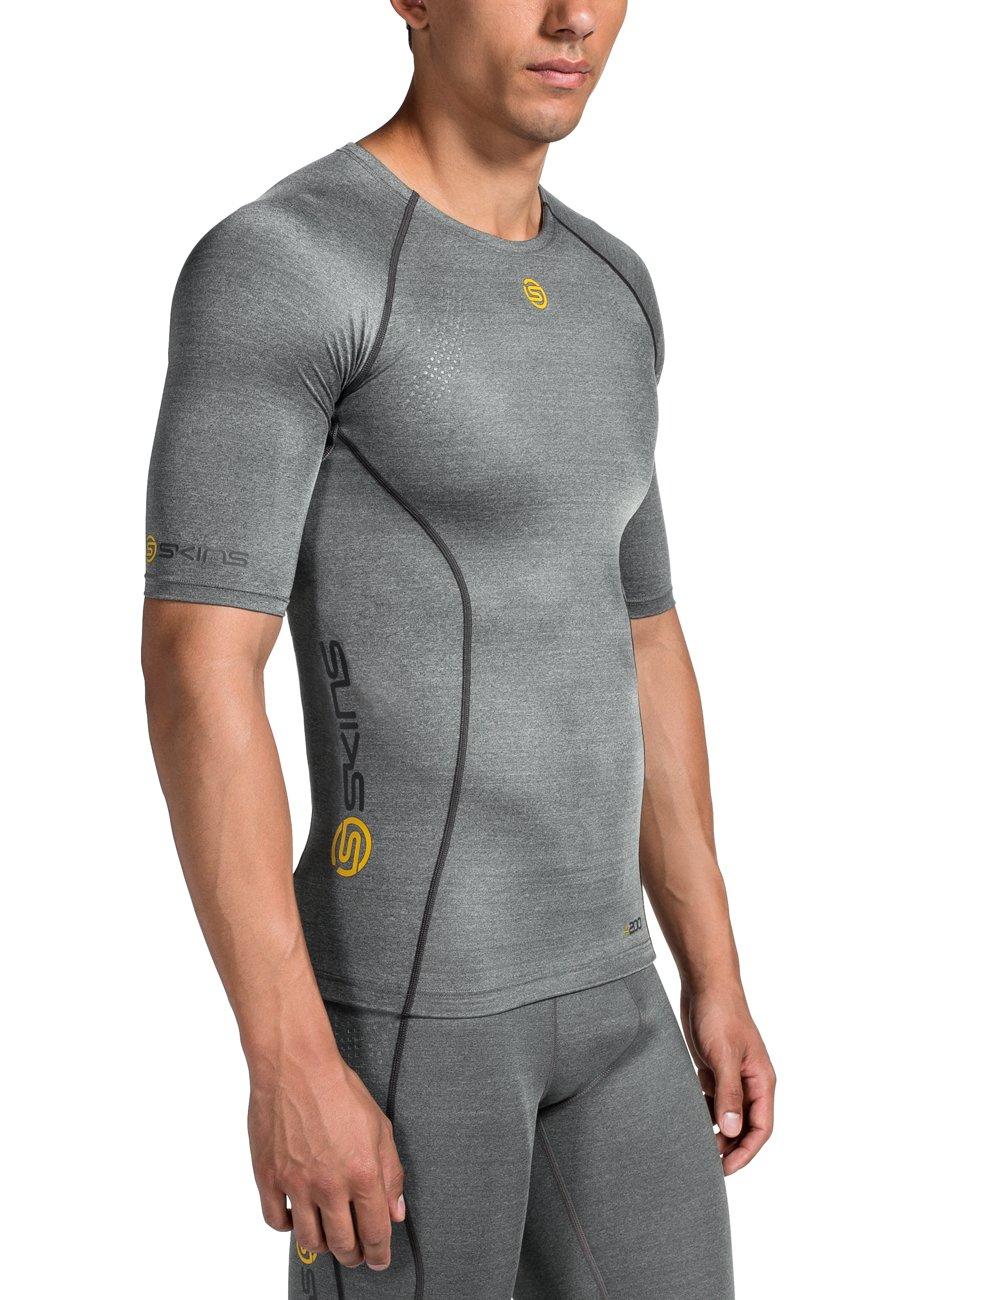 SKINS A200 Mens Top Short Sleeve